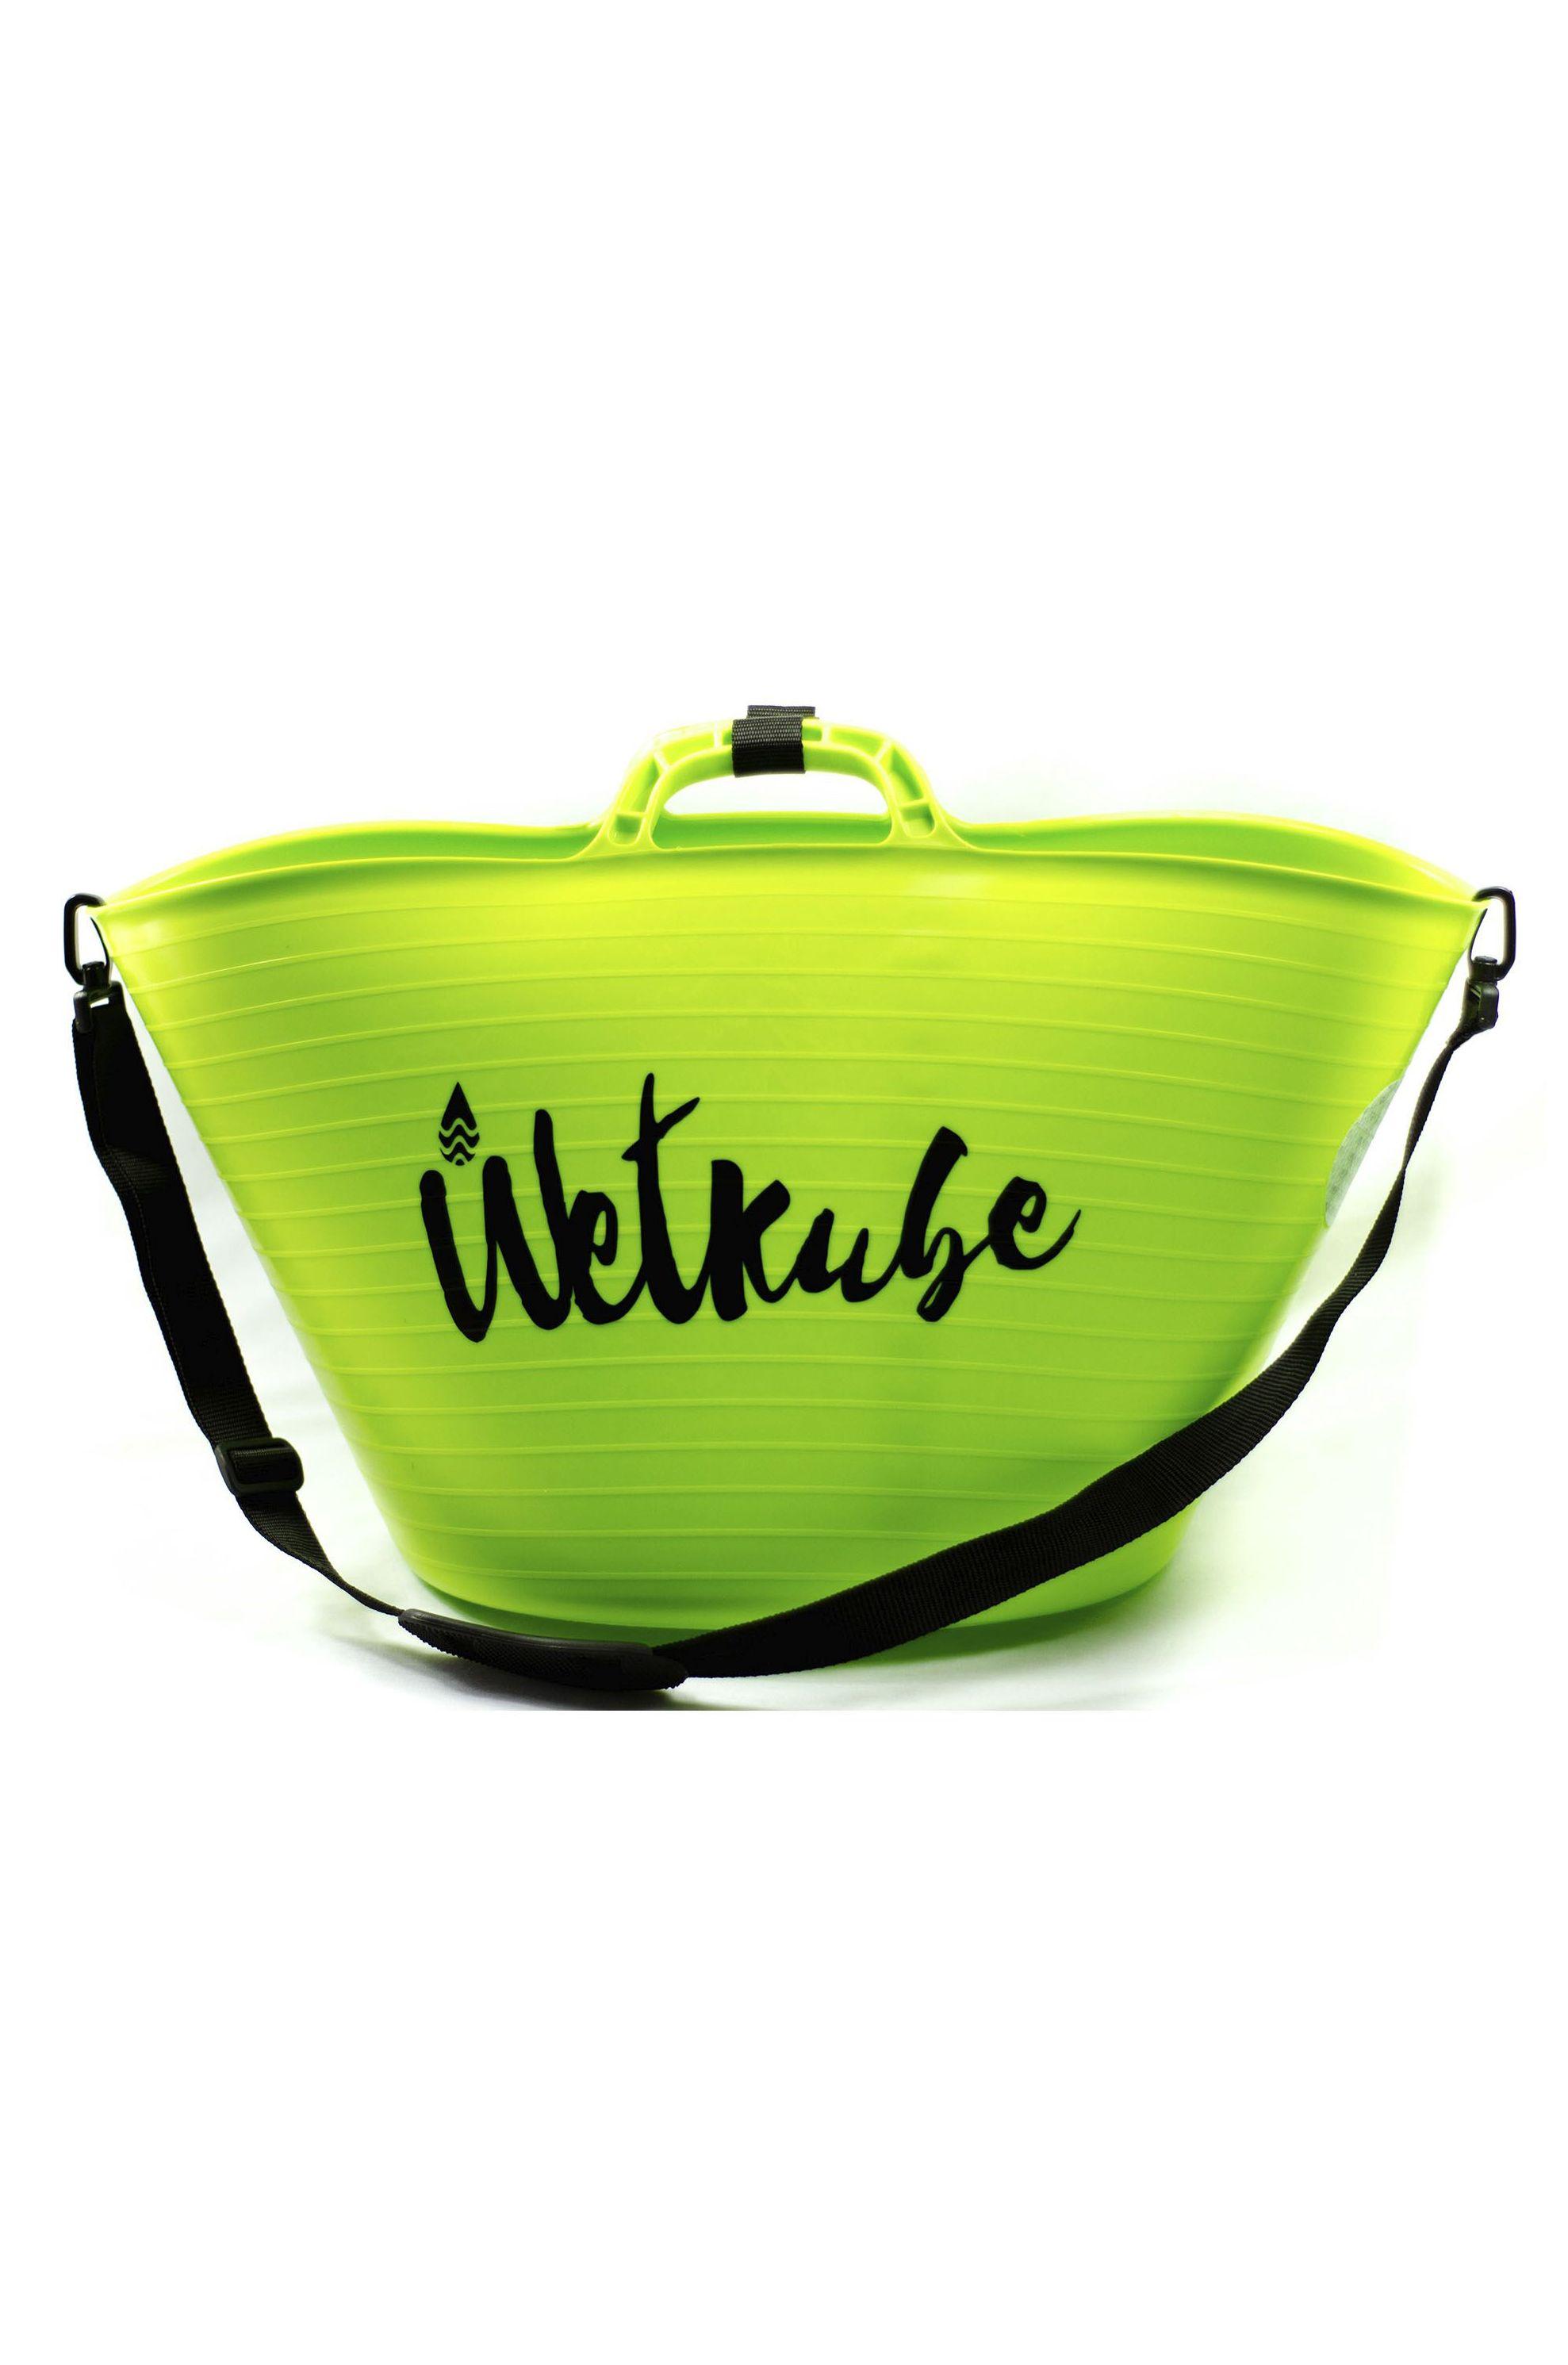 DV Wetkube BALDE M 25L Green